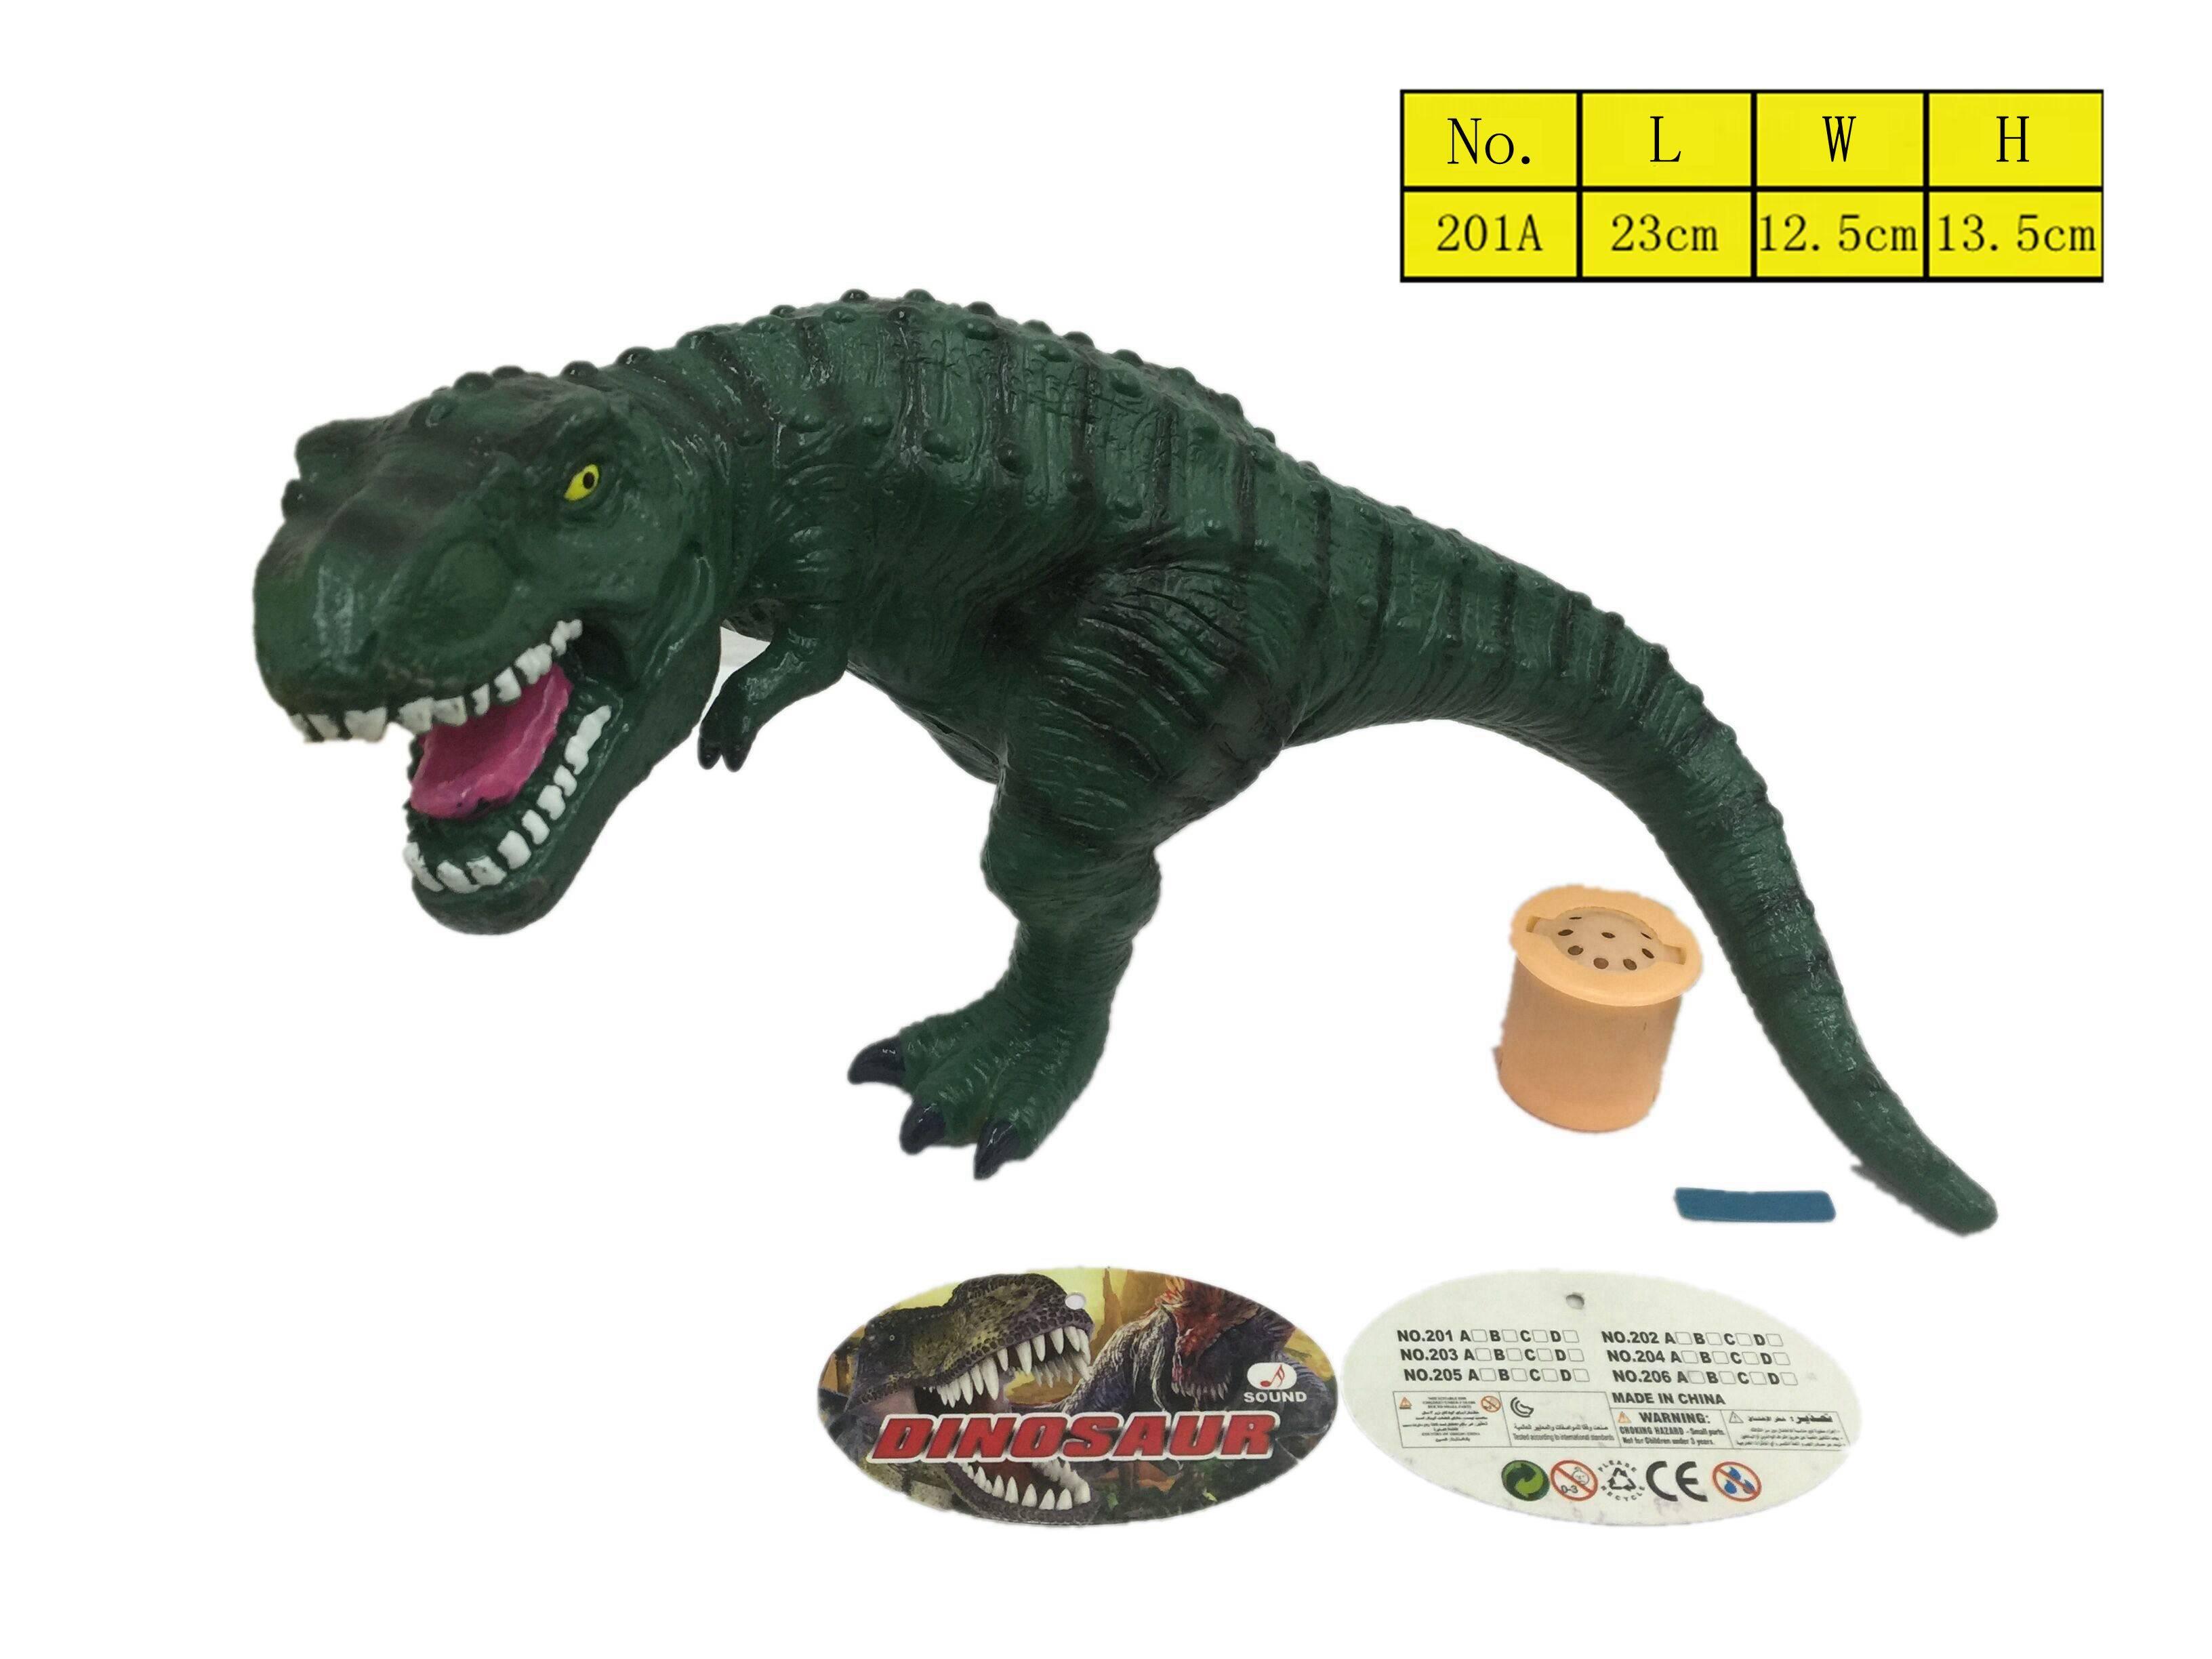 Vinyl Stuffed Cotton Dinosaur vinyl Toys Model with sound for Kids